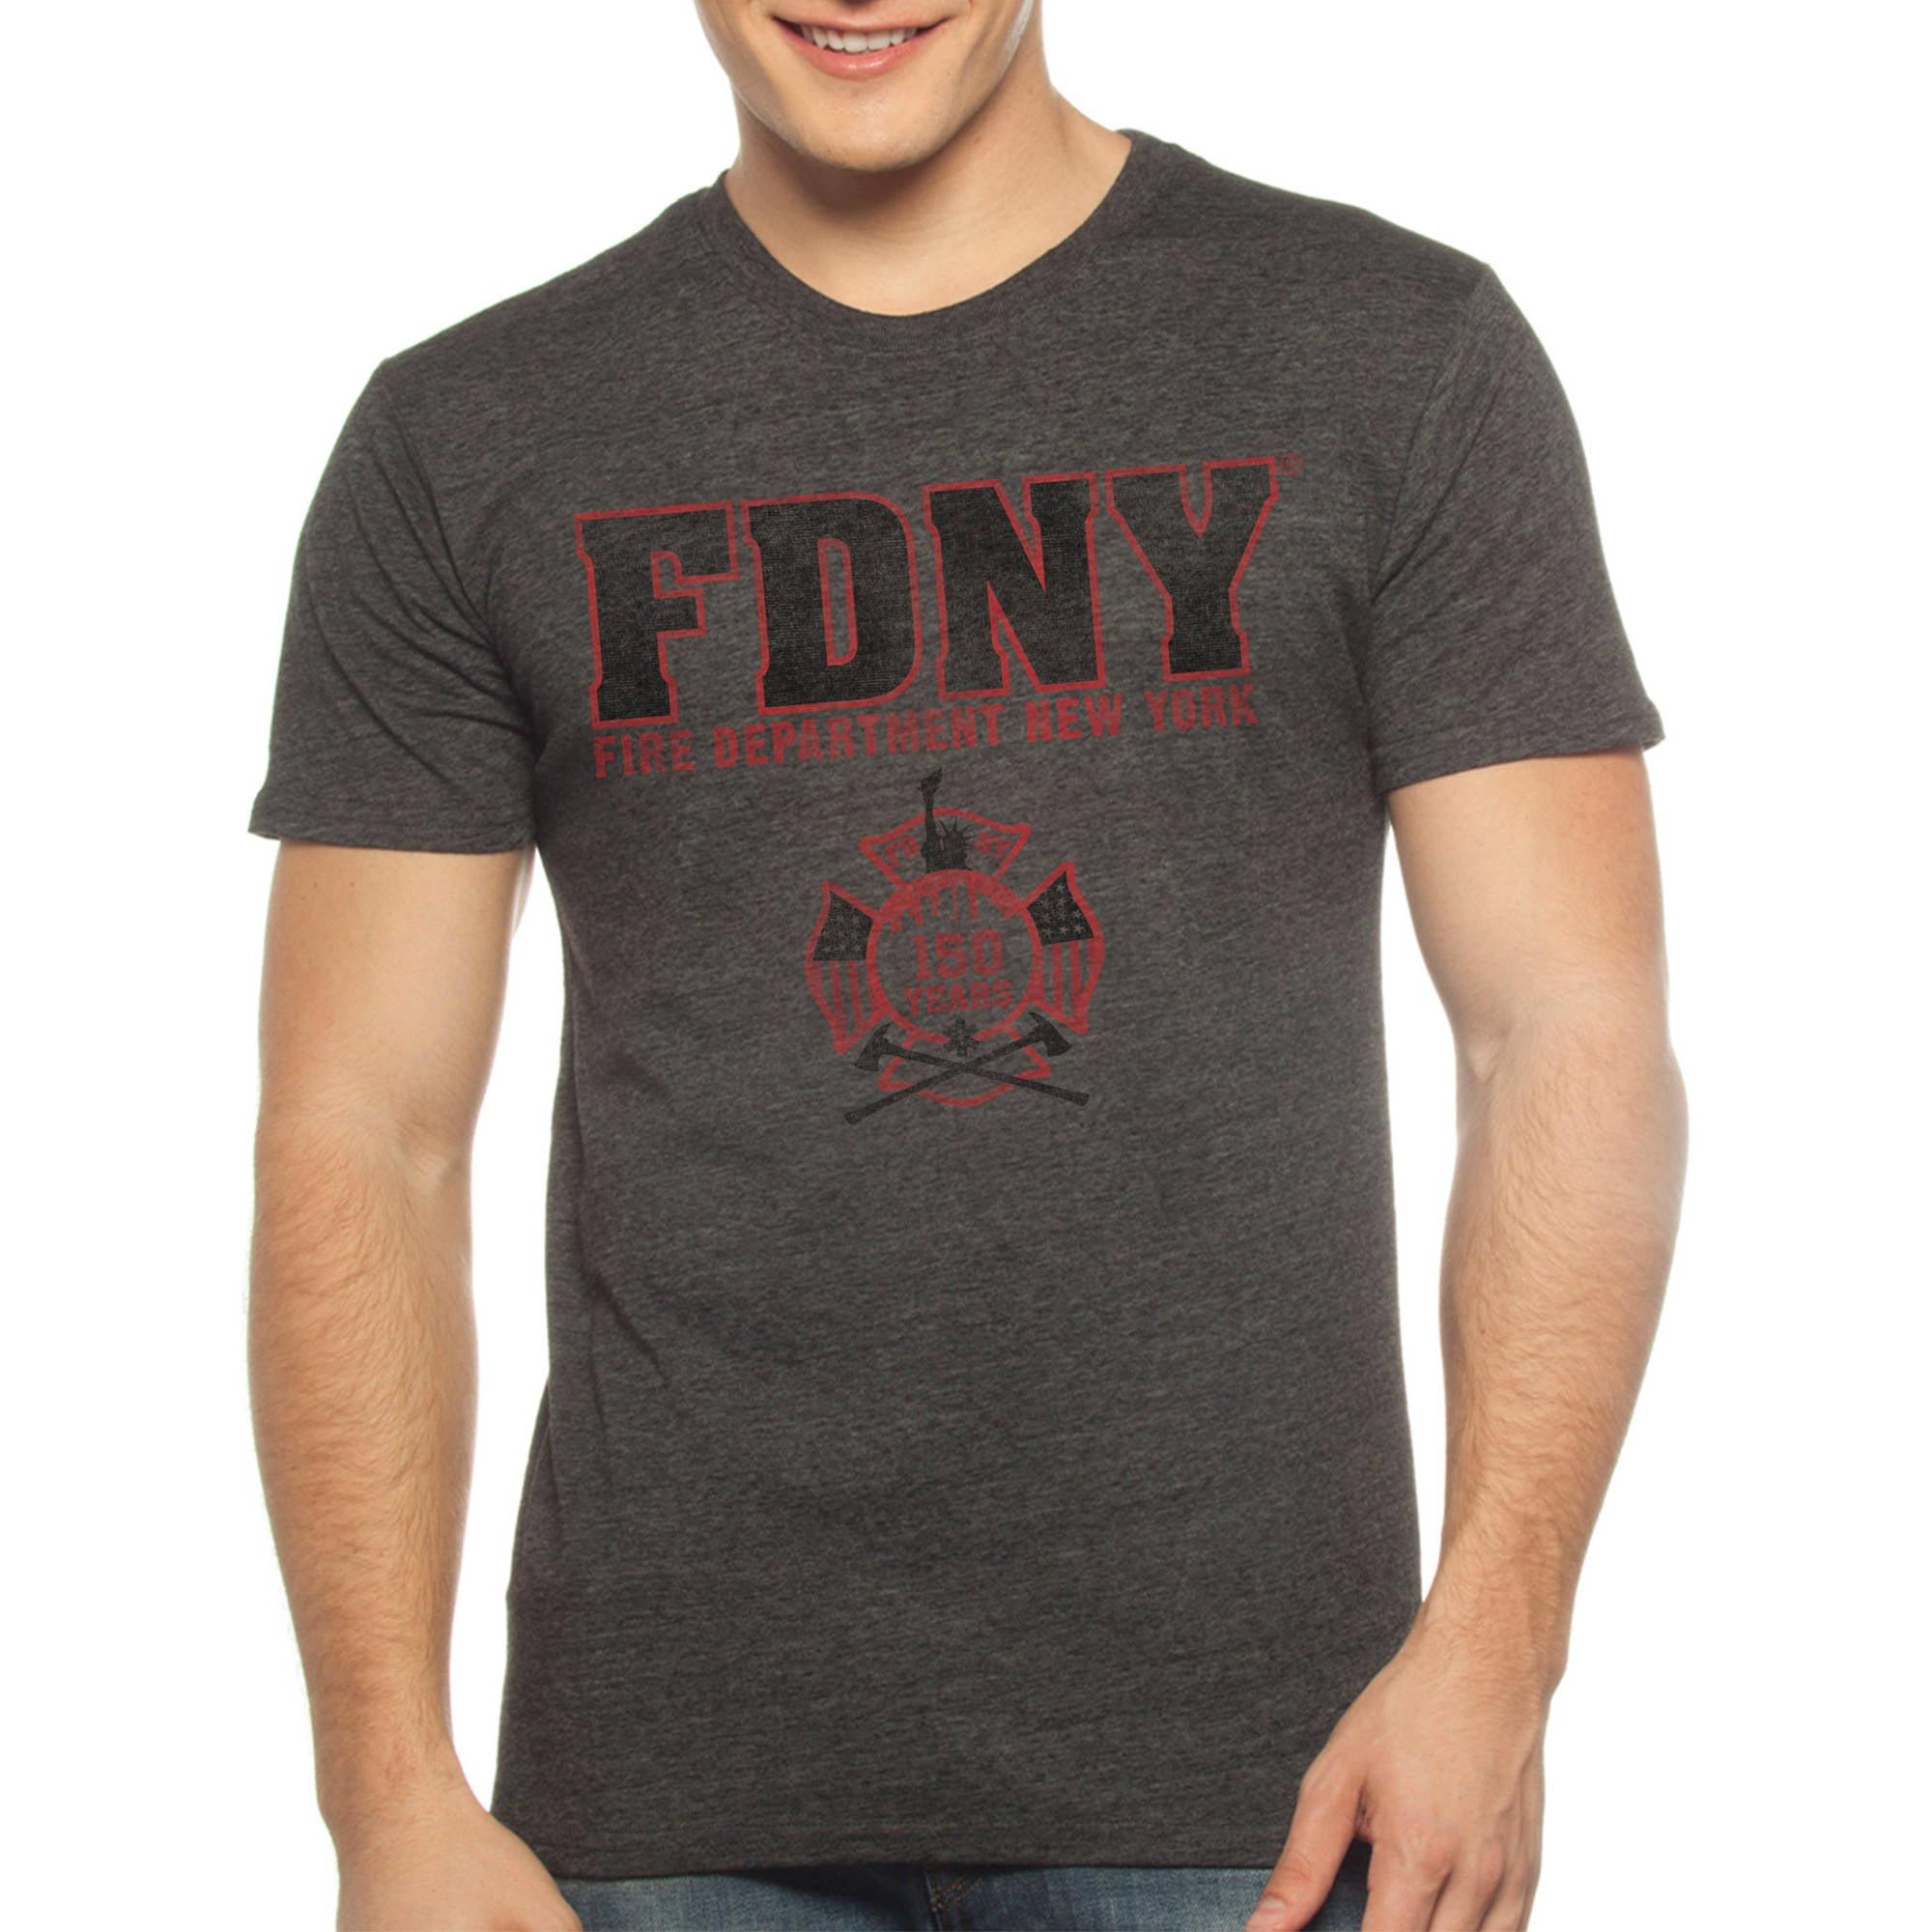 Fire Department New York FDNY Men's Short Sleeve Graphic Tee